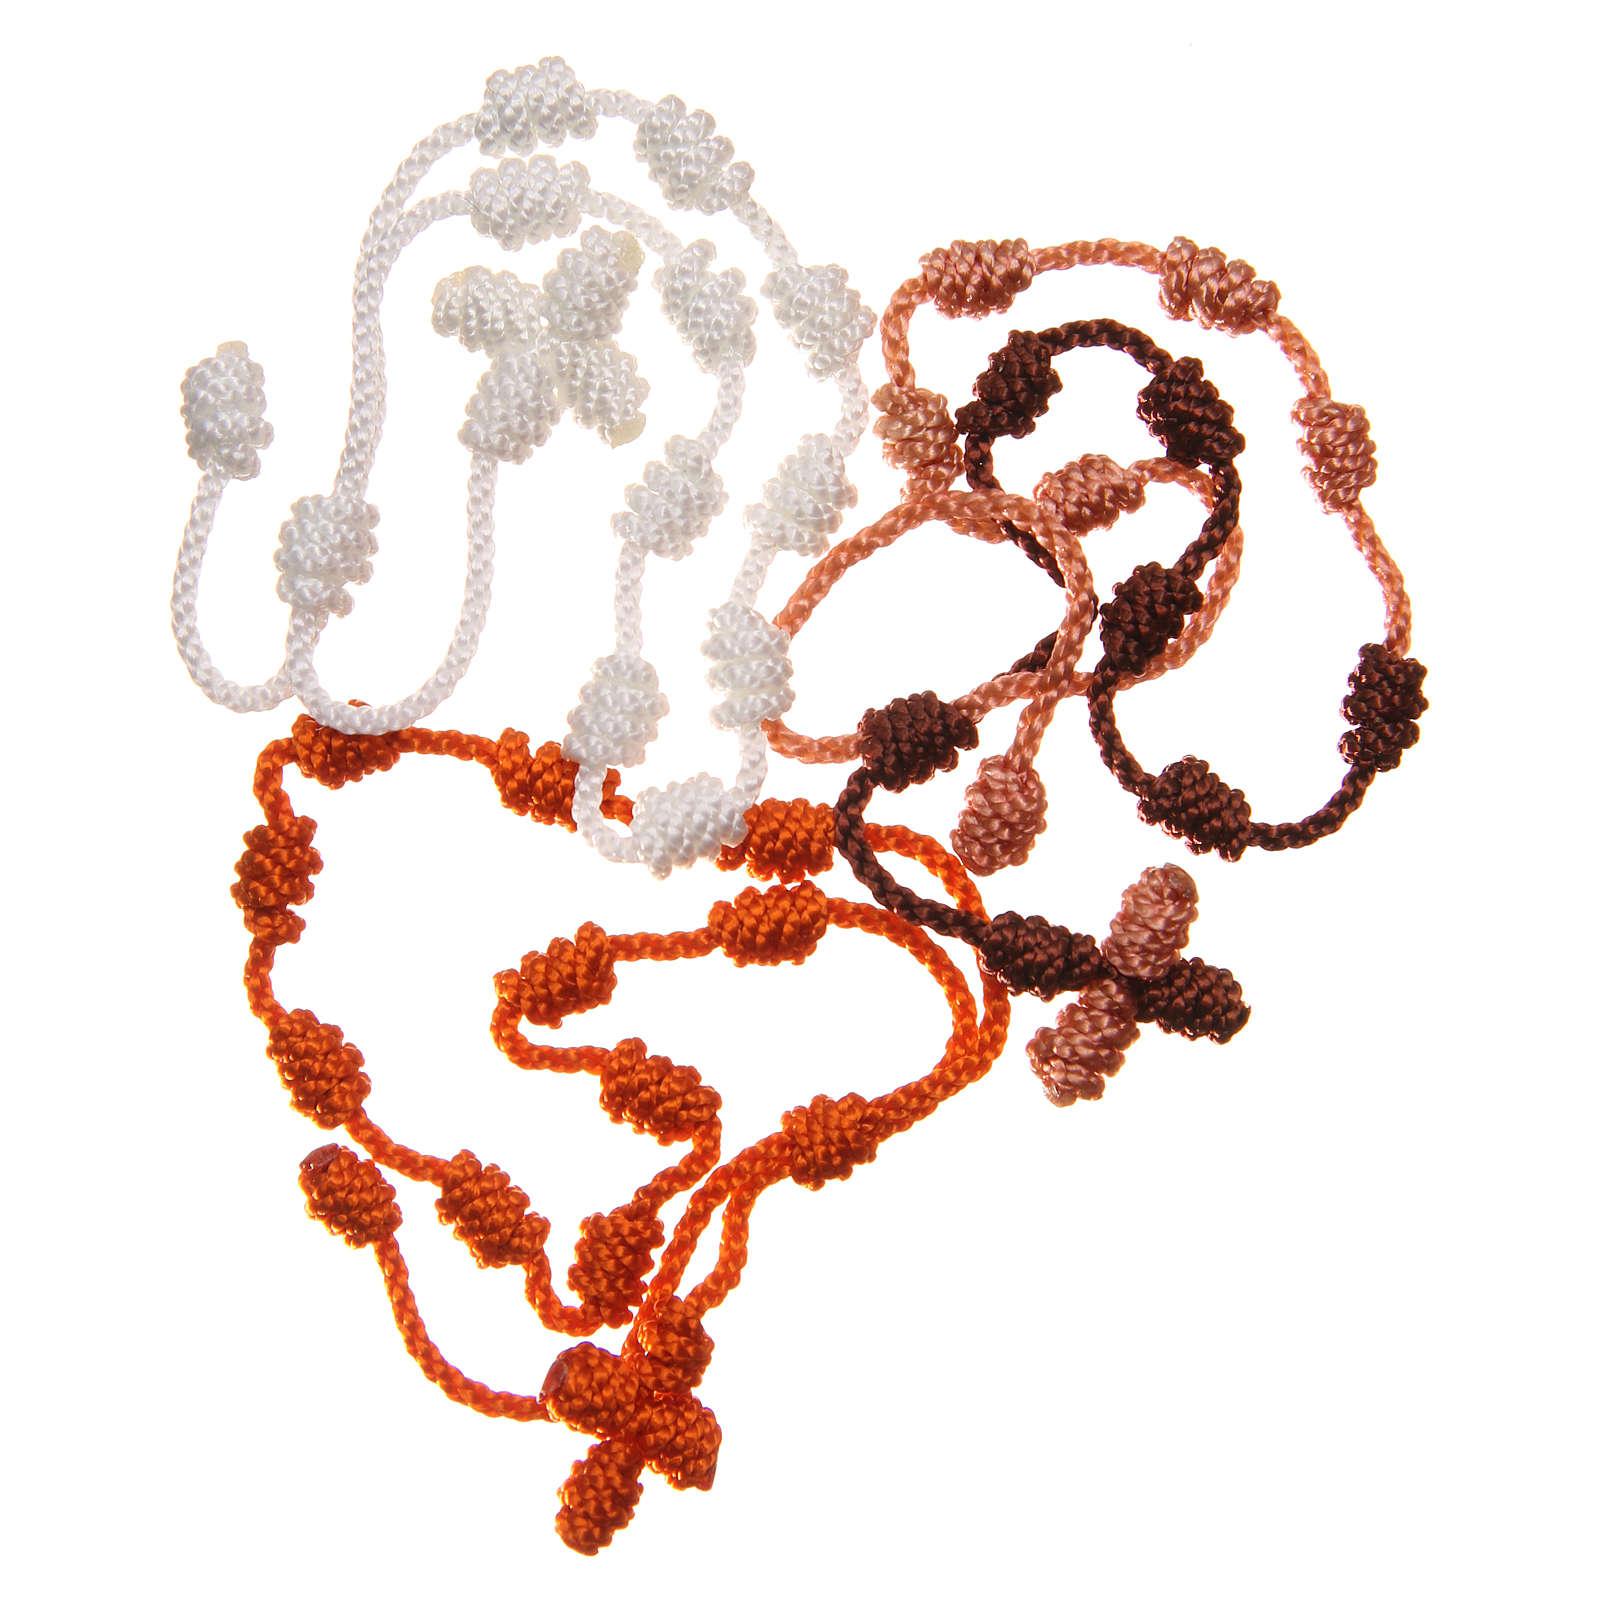 STOCK Rosenkranz Armband aus Seil gemischte Farbe 4